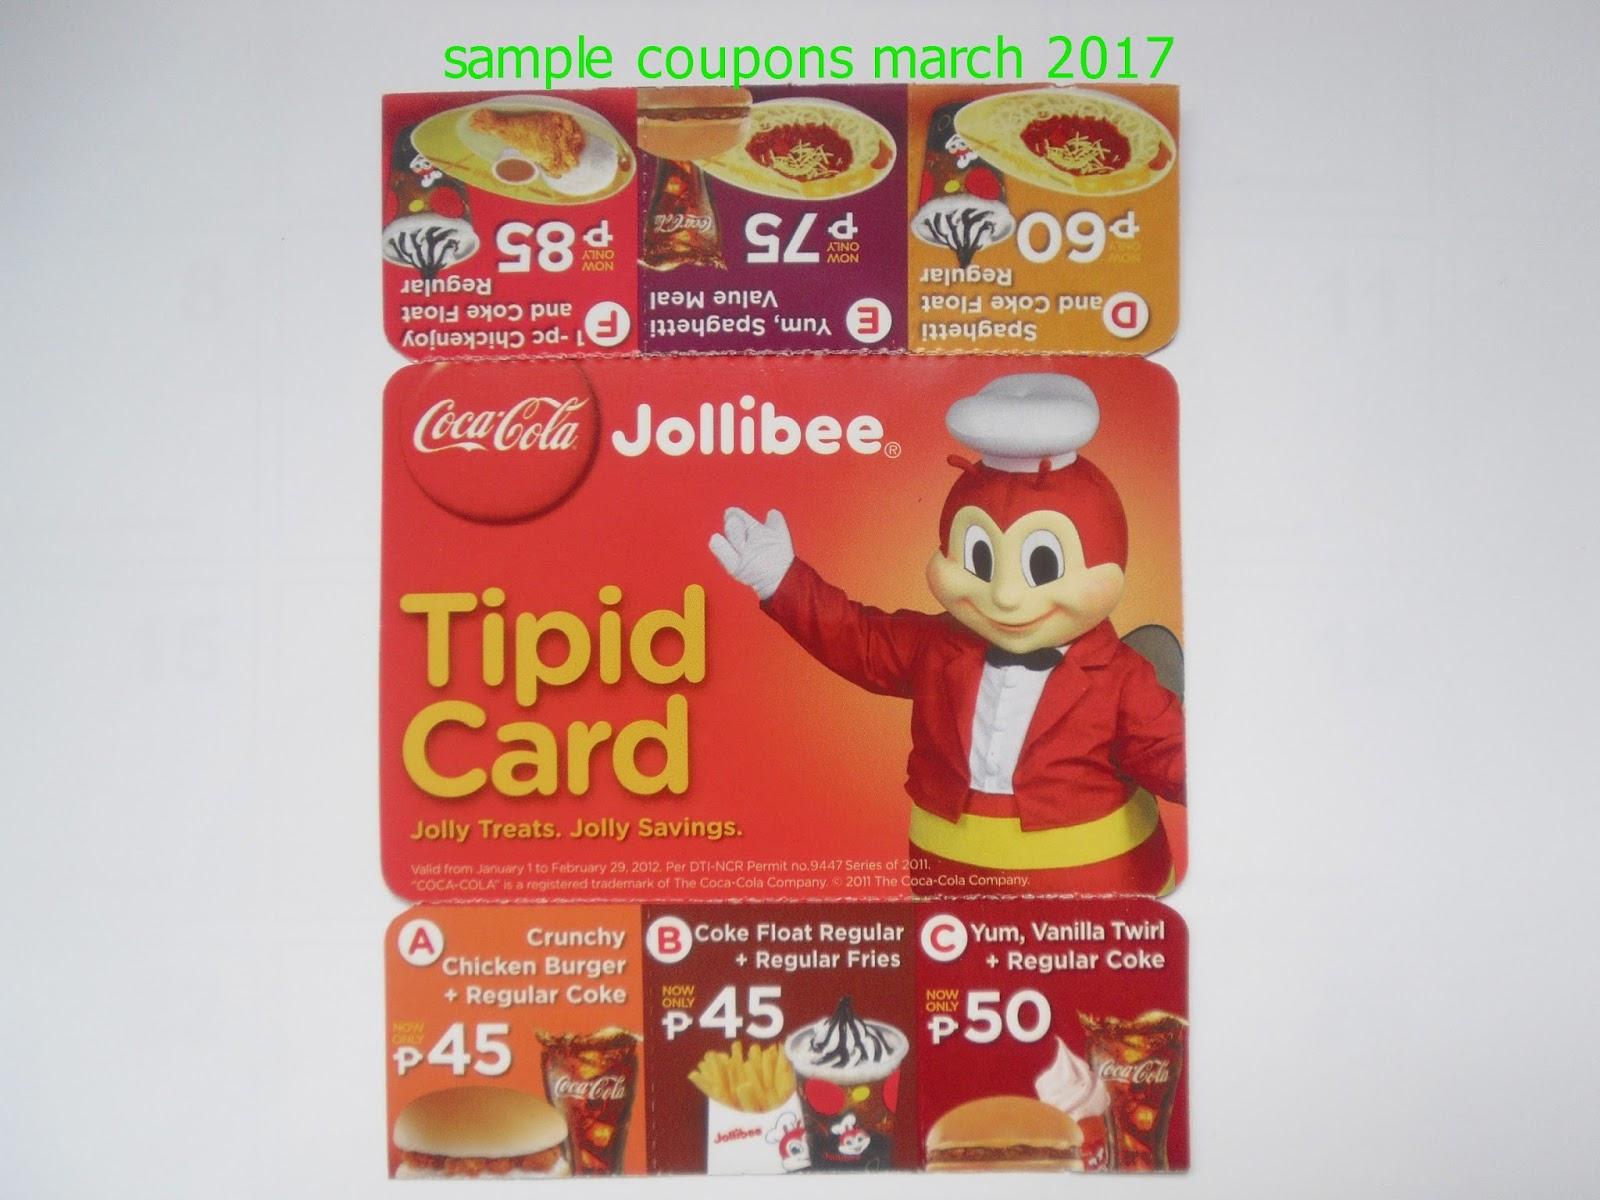 jollibee Jollibee foods corporation (jfc), which has a market capitalization of around $5 billion, owns 14 brands with 4,300 restaurants around the world.